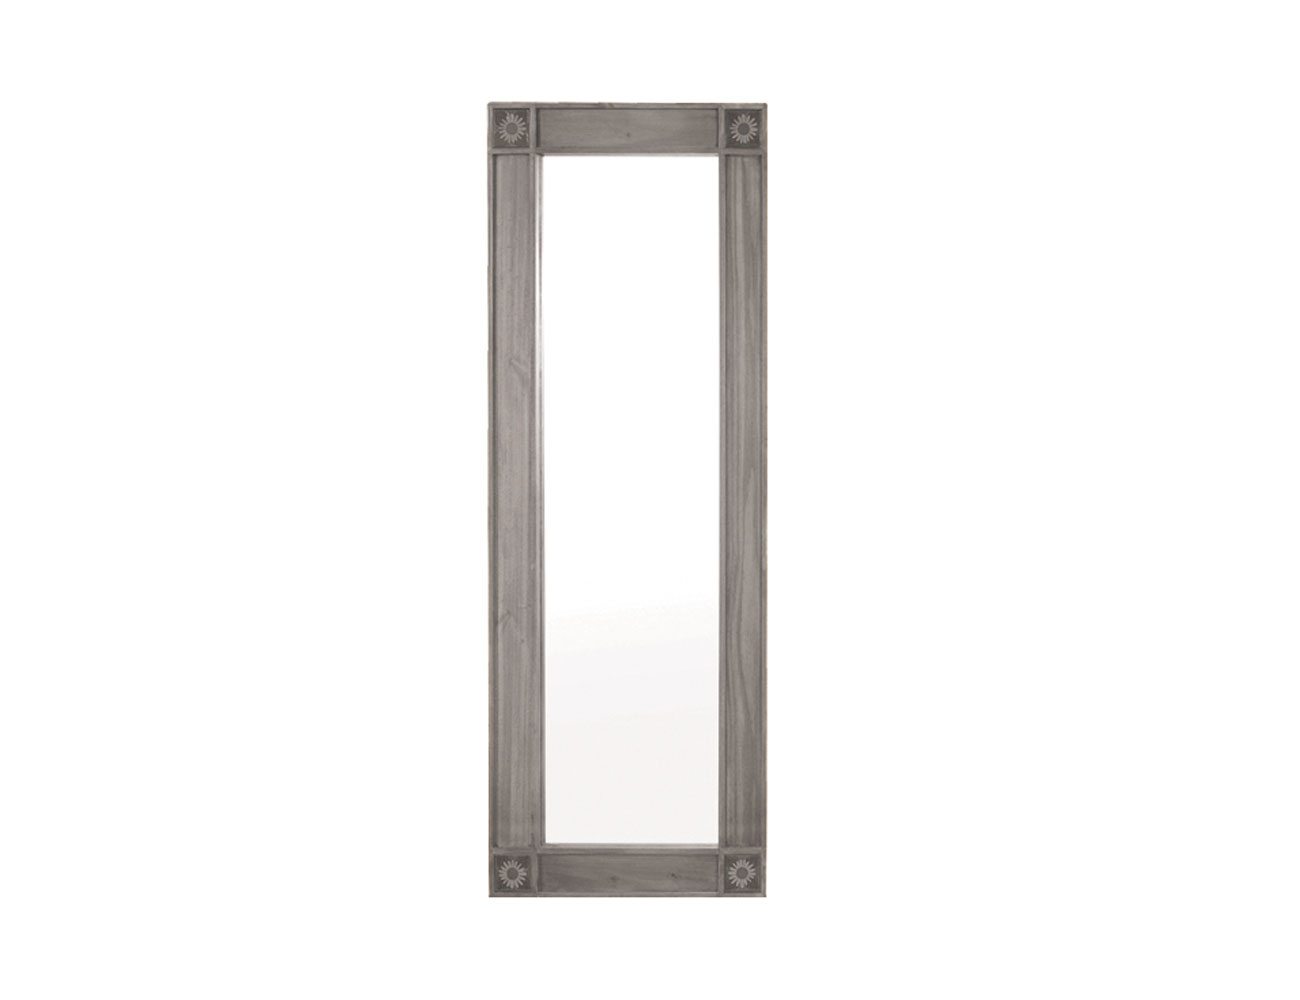 1920402 espejo vestidor jalisco girasol madera 90 170